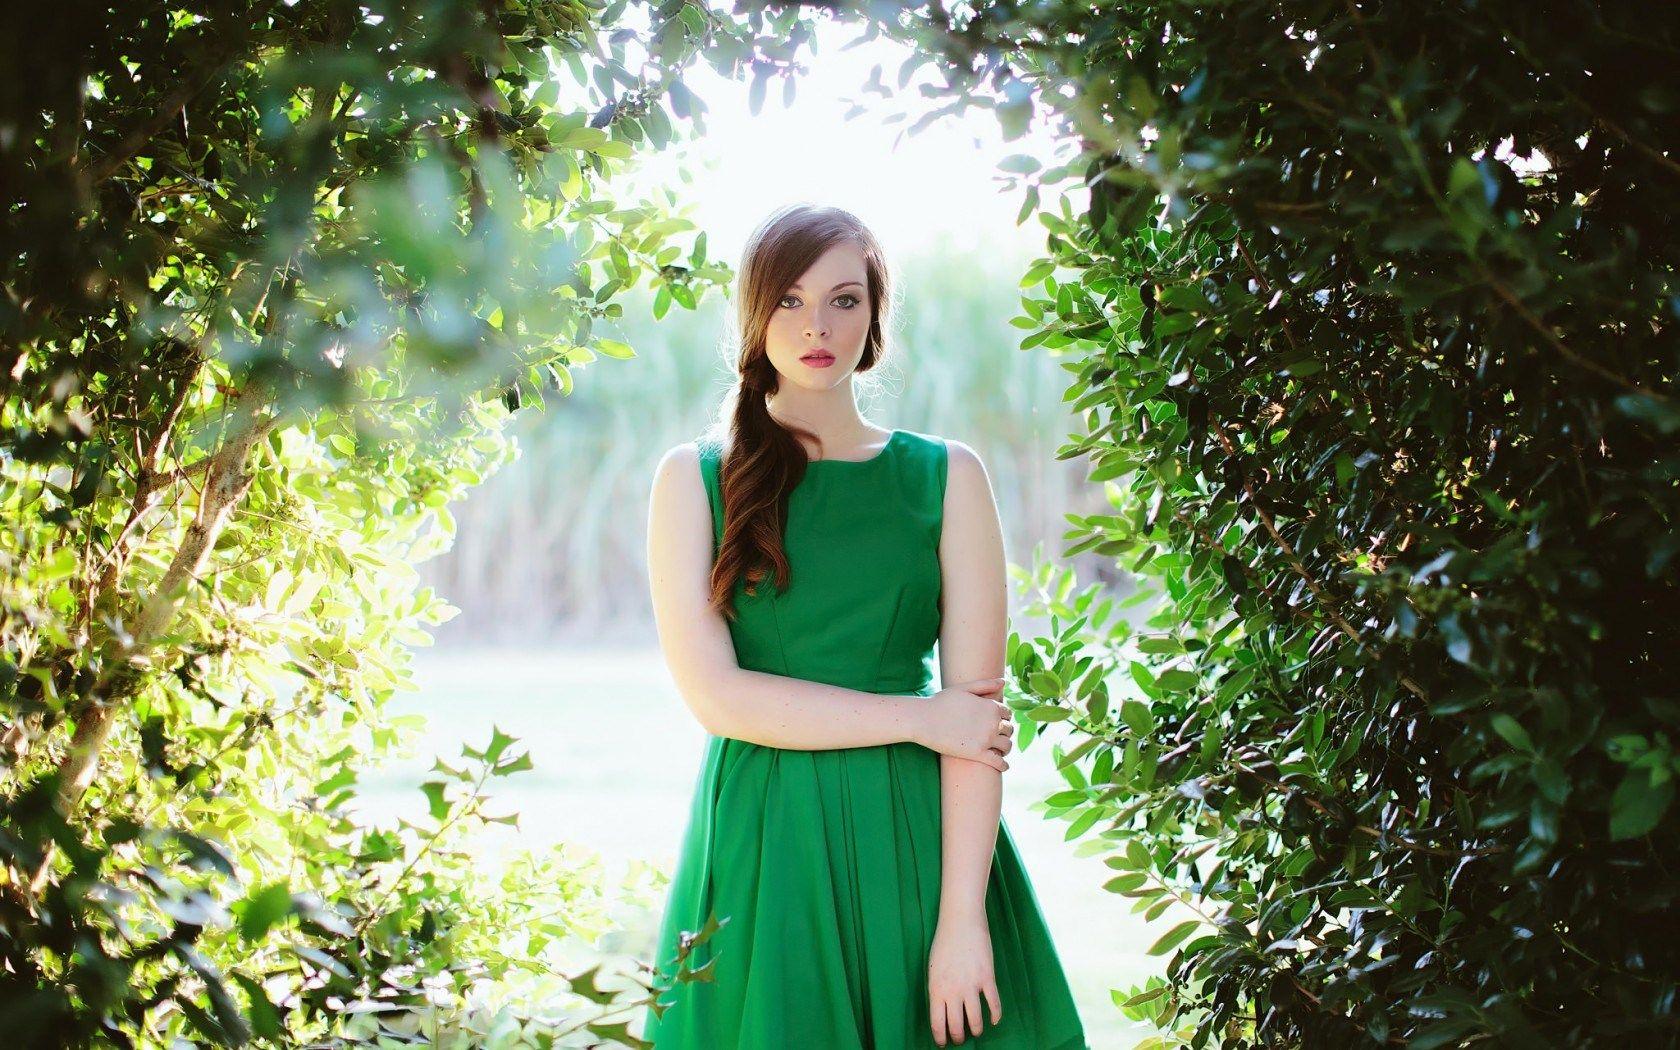 Lovely Girl Model Green Dress Hd Wallpaper Freehdwall Nice